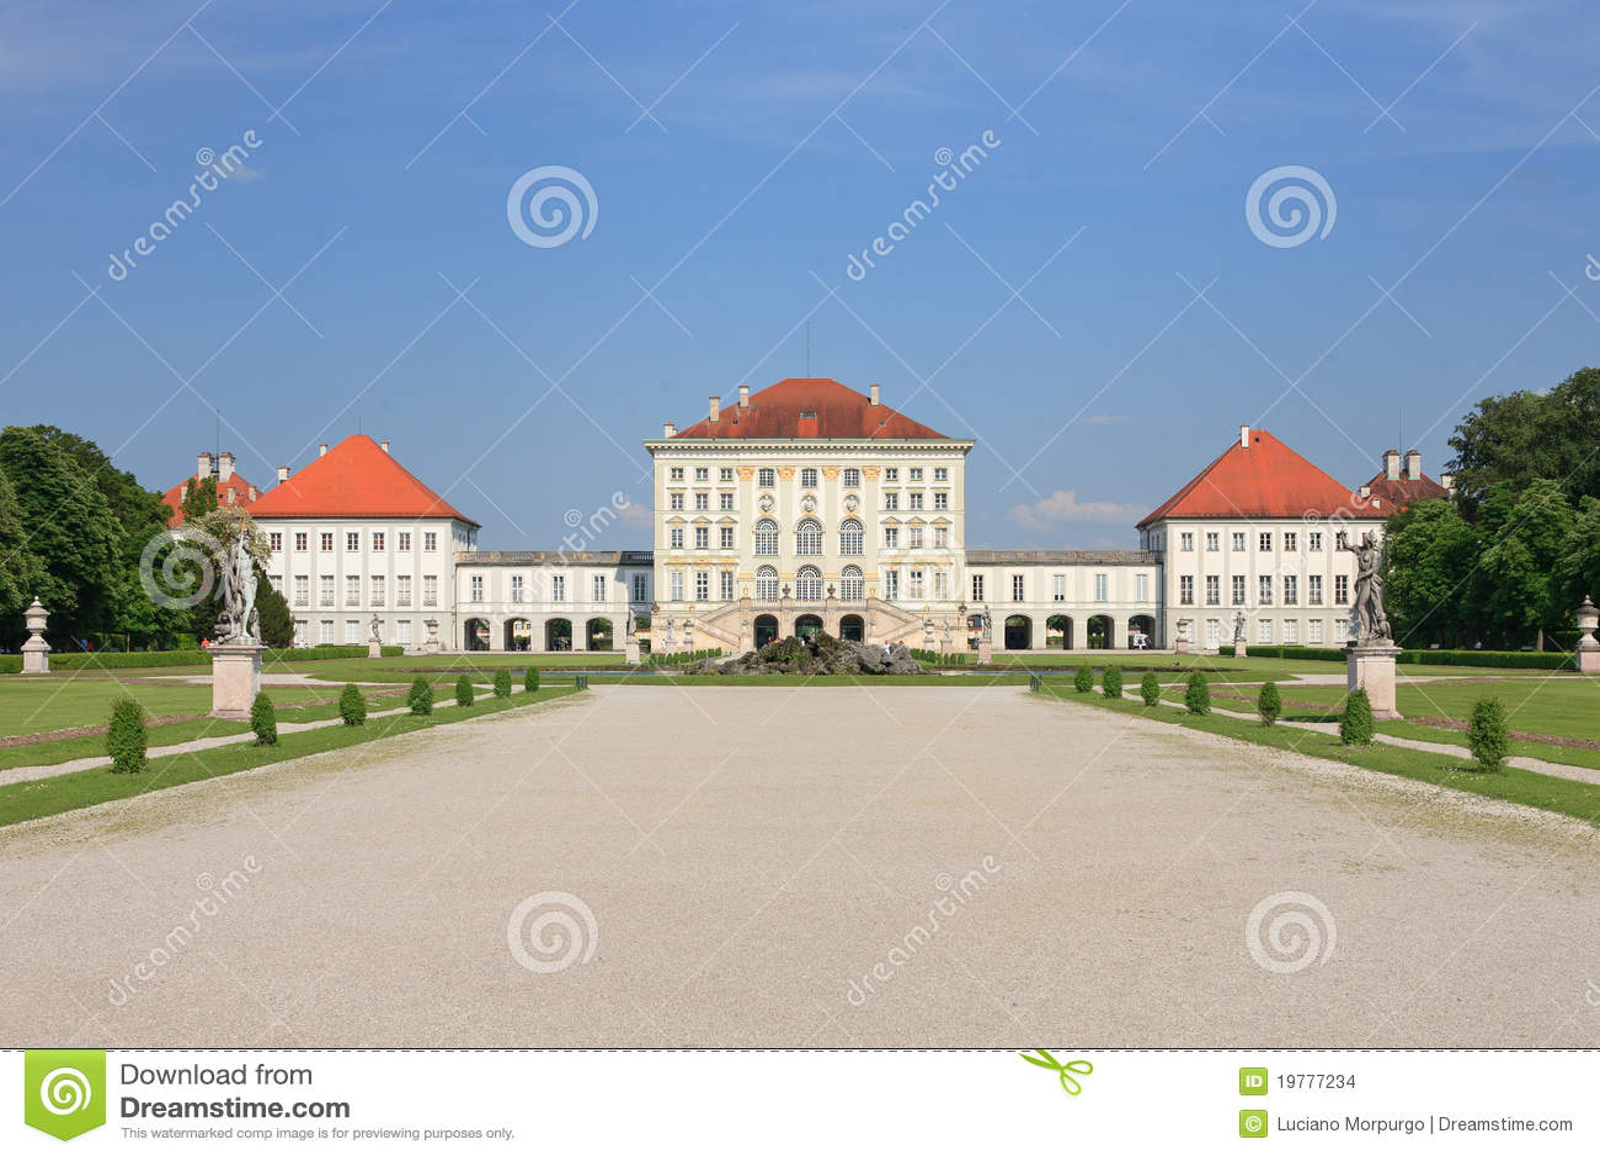 Germany munich nymphenburgslott